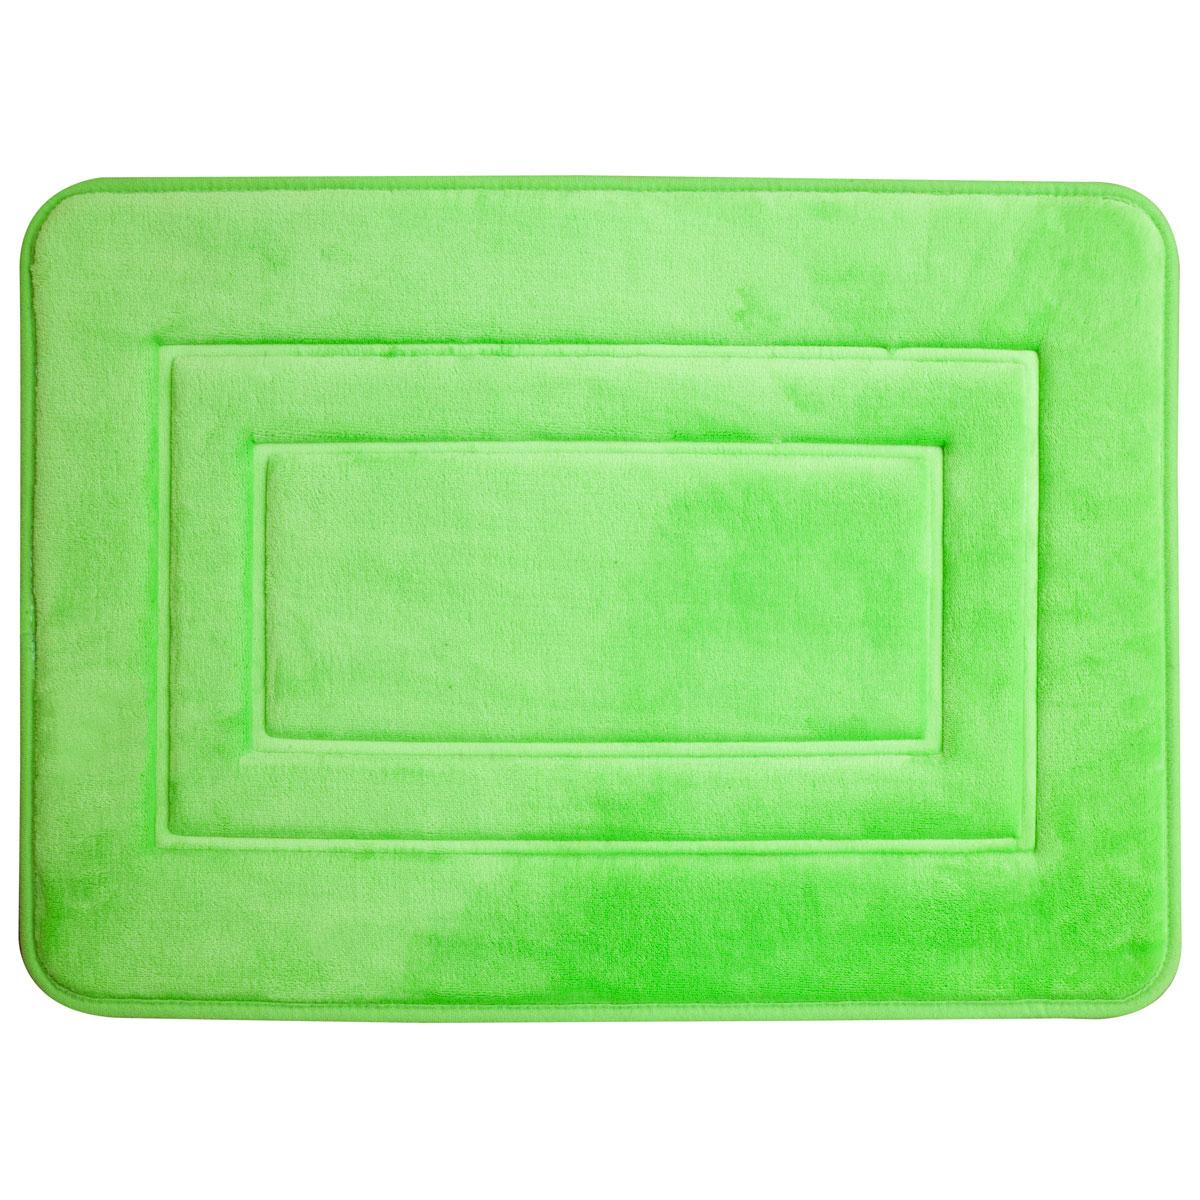 Super mäkká kúpeľňa koberec 40x60 San zelená